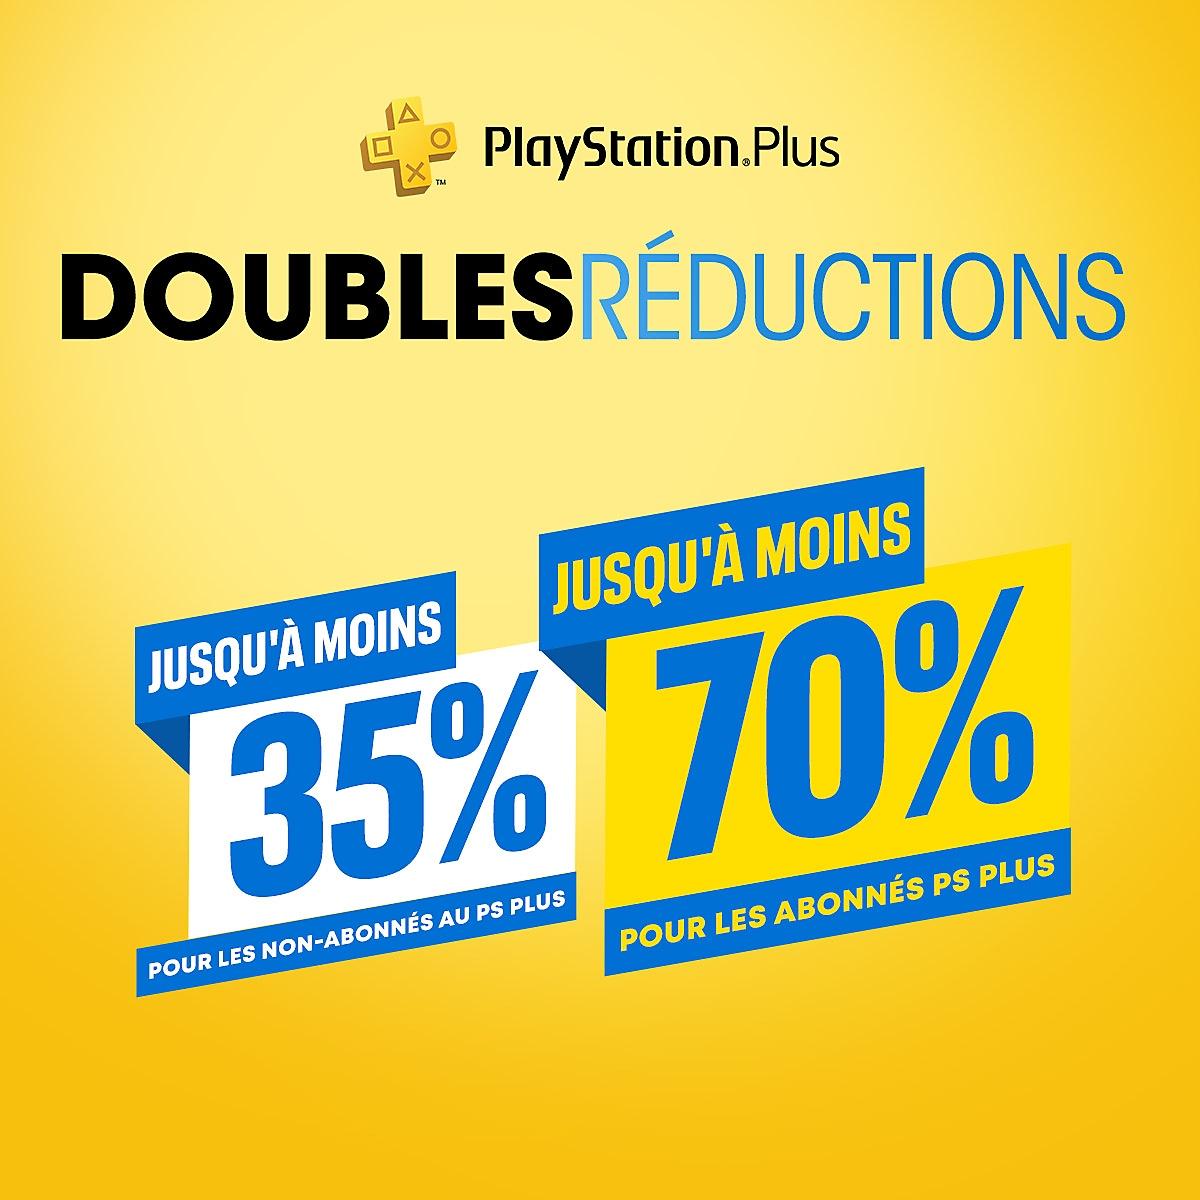 PlayStation Store - Doubles réductions PlayStationPlus